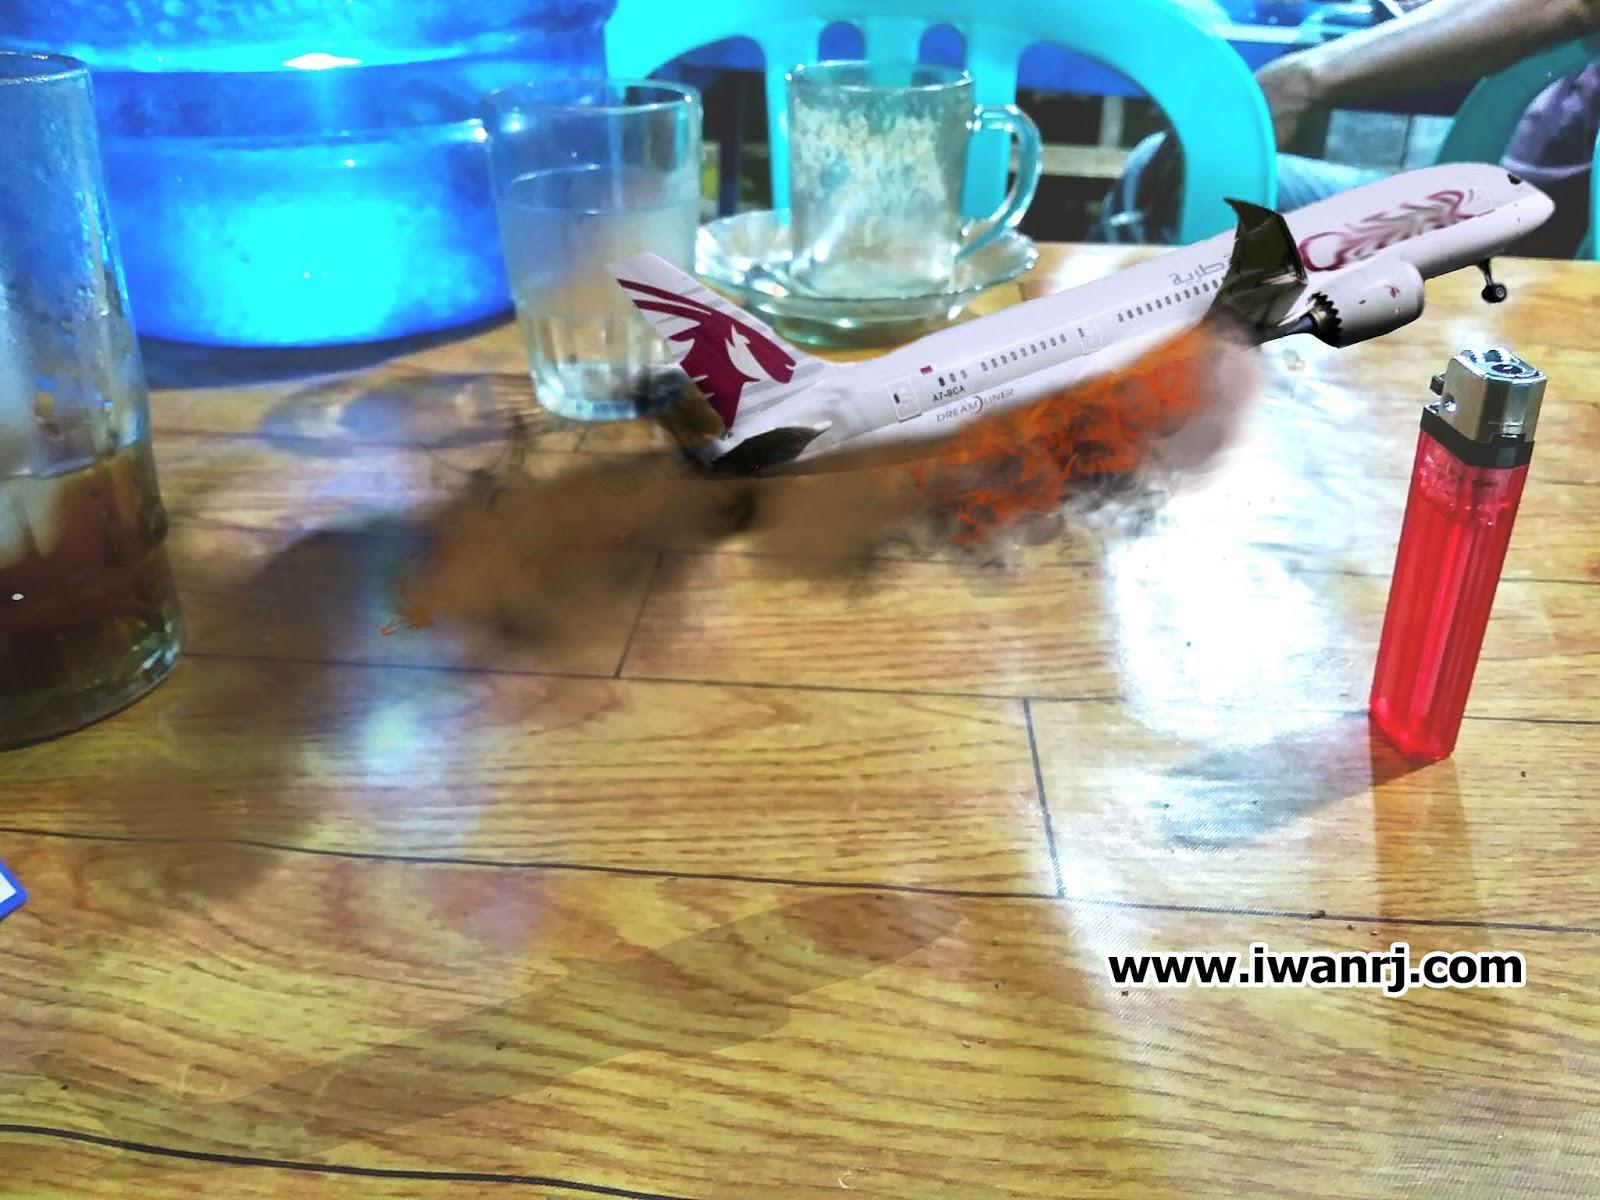 Gambar: Pesawat Meluncur Terbakar Diatas Meja Makan Edited By: Iwan RJ Lokasi: Warung Nasi Goreng Malam (Samping Pasar Buah Sriwijaya) Kualatungkal, Tanjung Jabung Barat - Jambi.